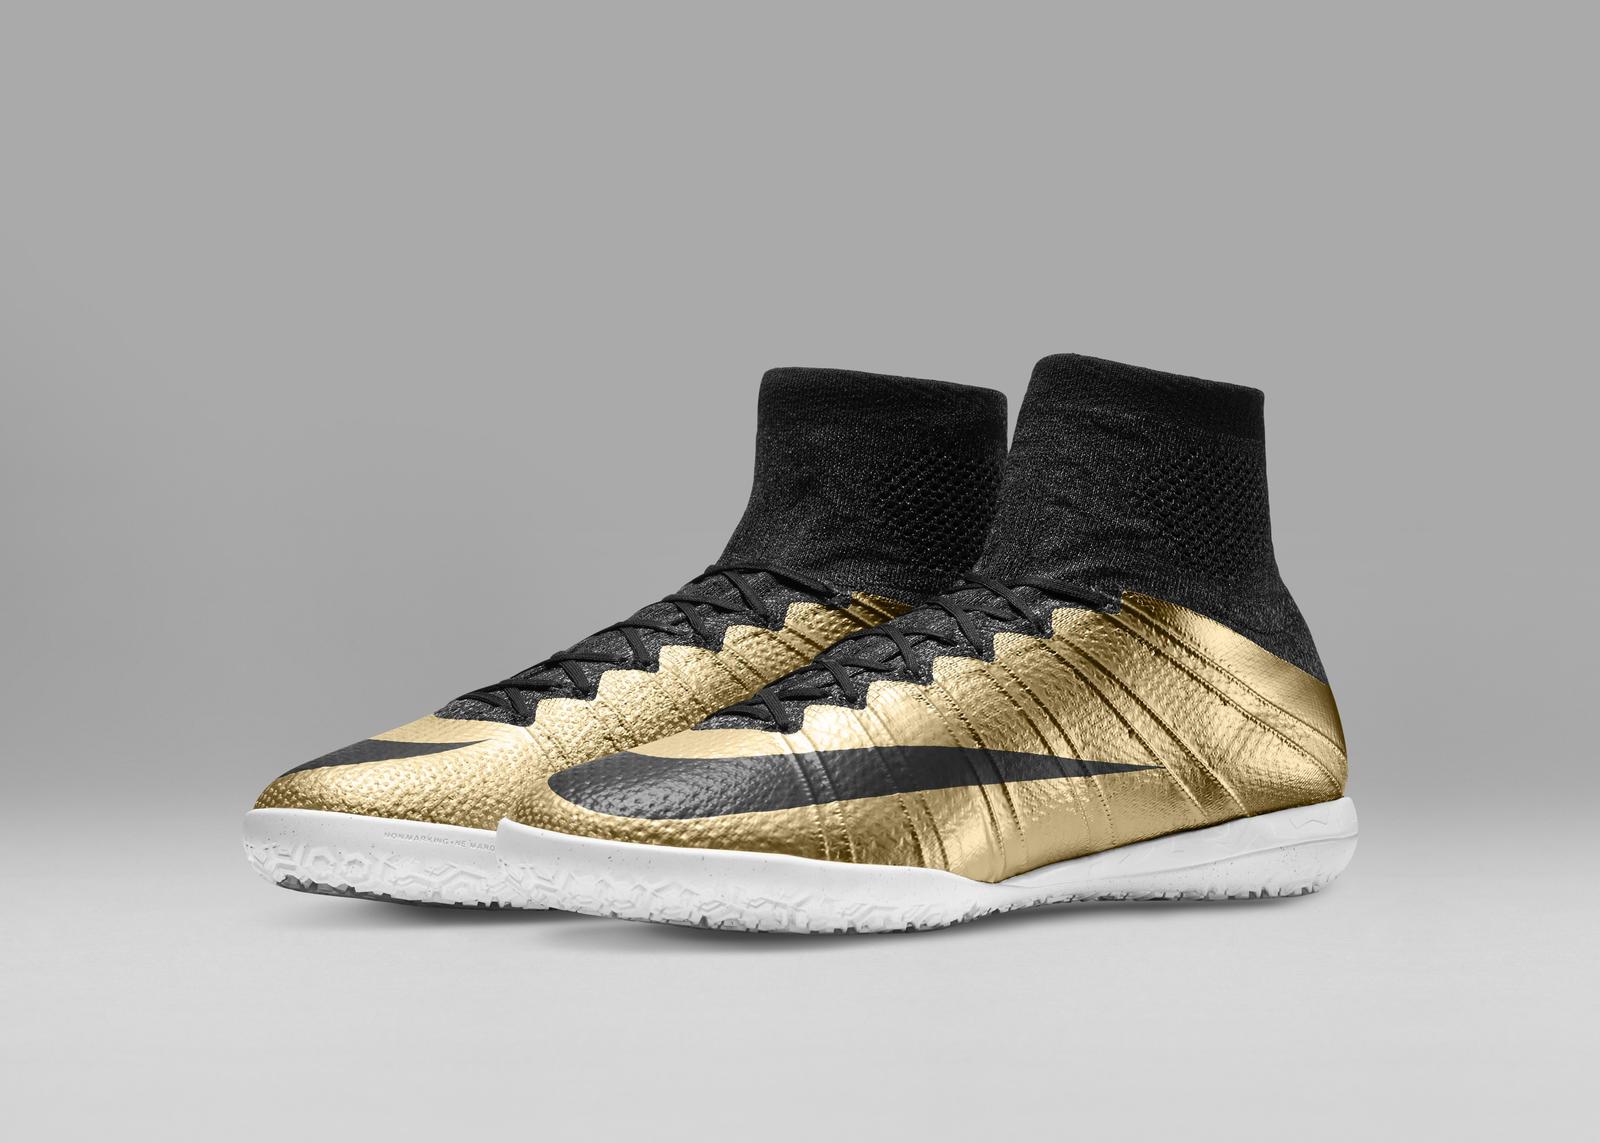 Nike-Football-Soccer_NFX_STREET_MERCURIALX_PROXIMO_IC_E_PREM